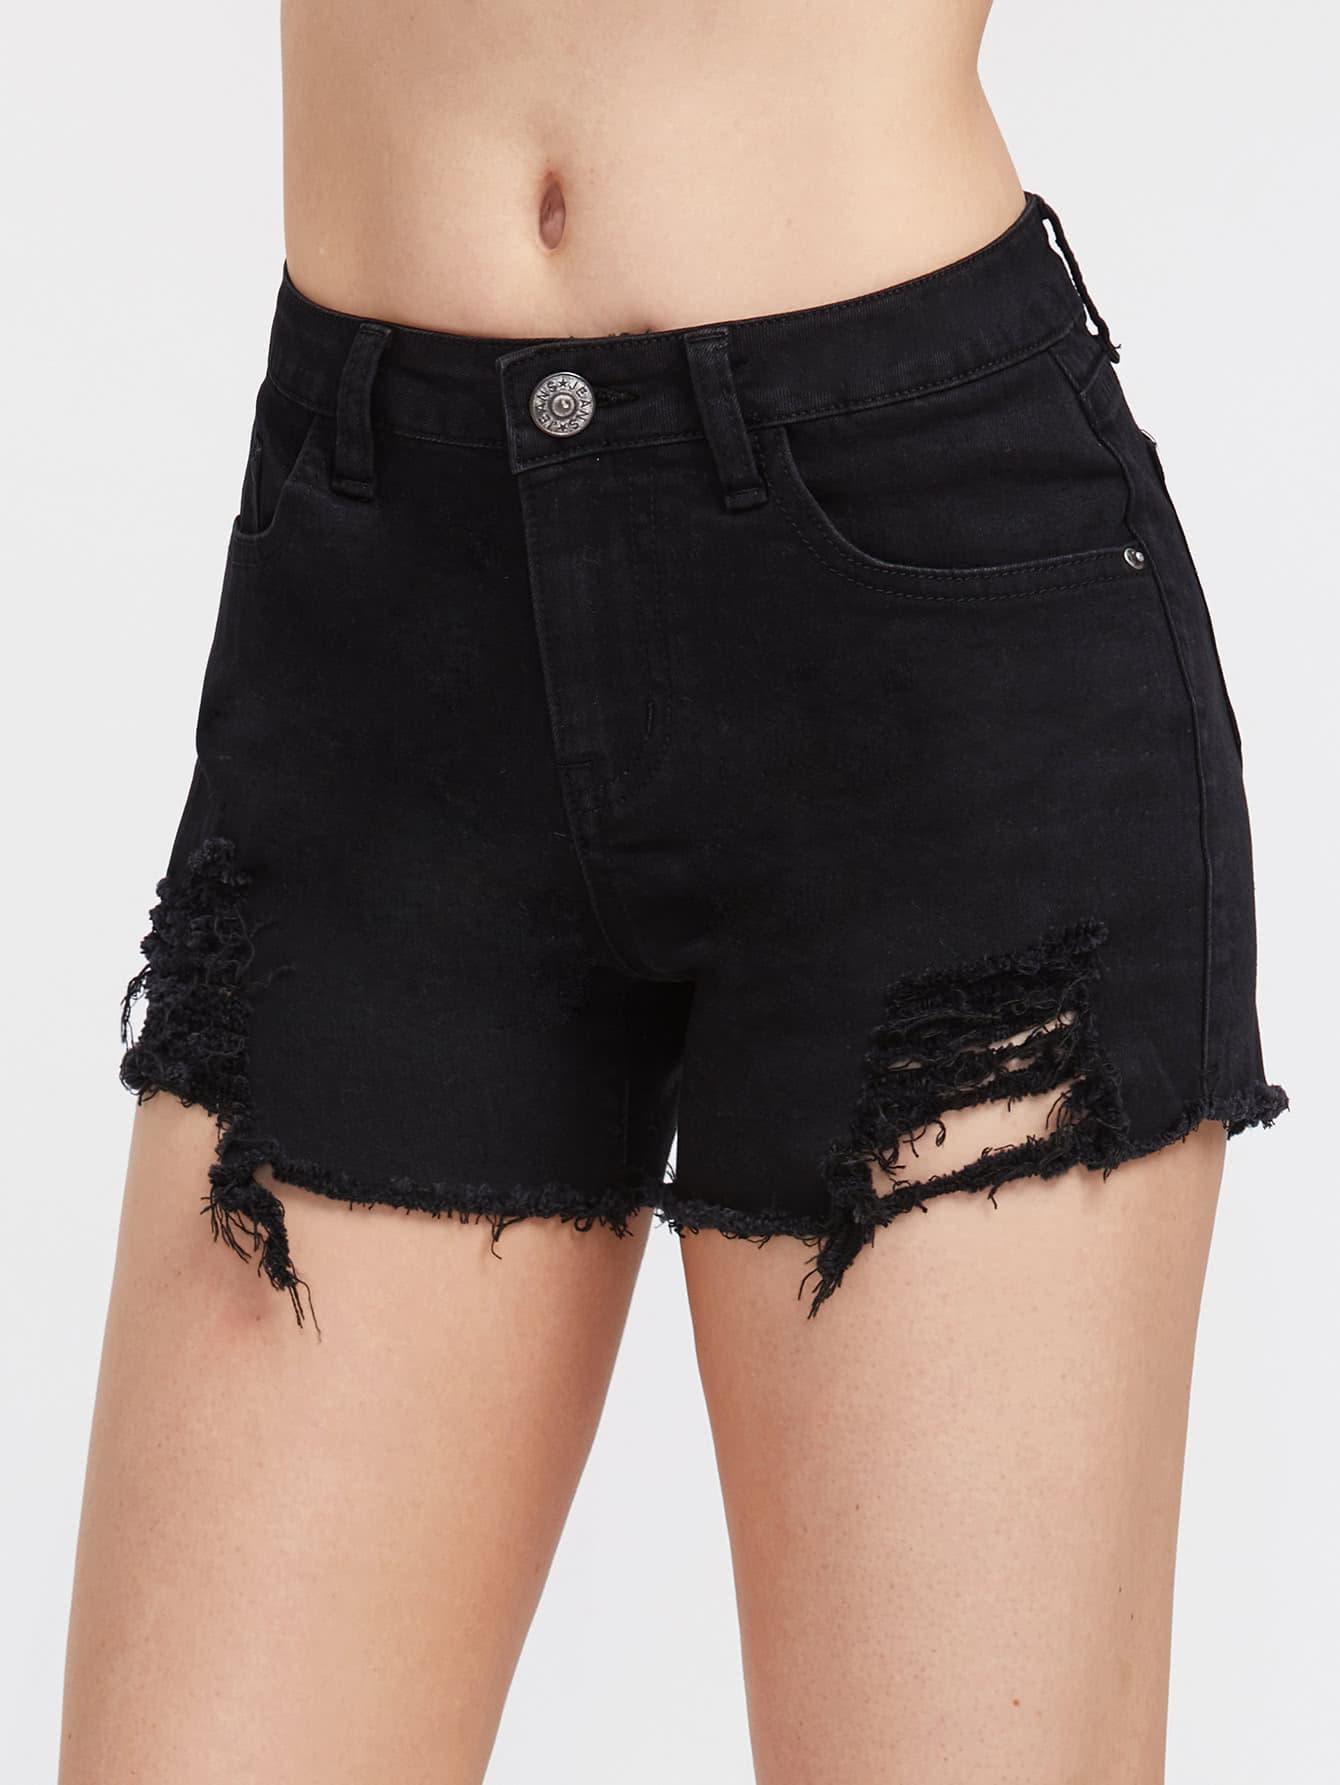 5 Pocket Distressed Denim Shorts shorts170523450